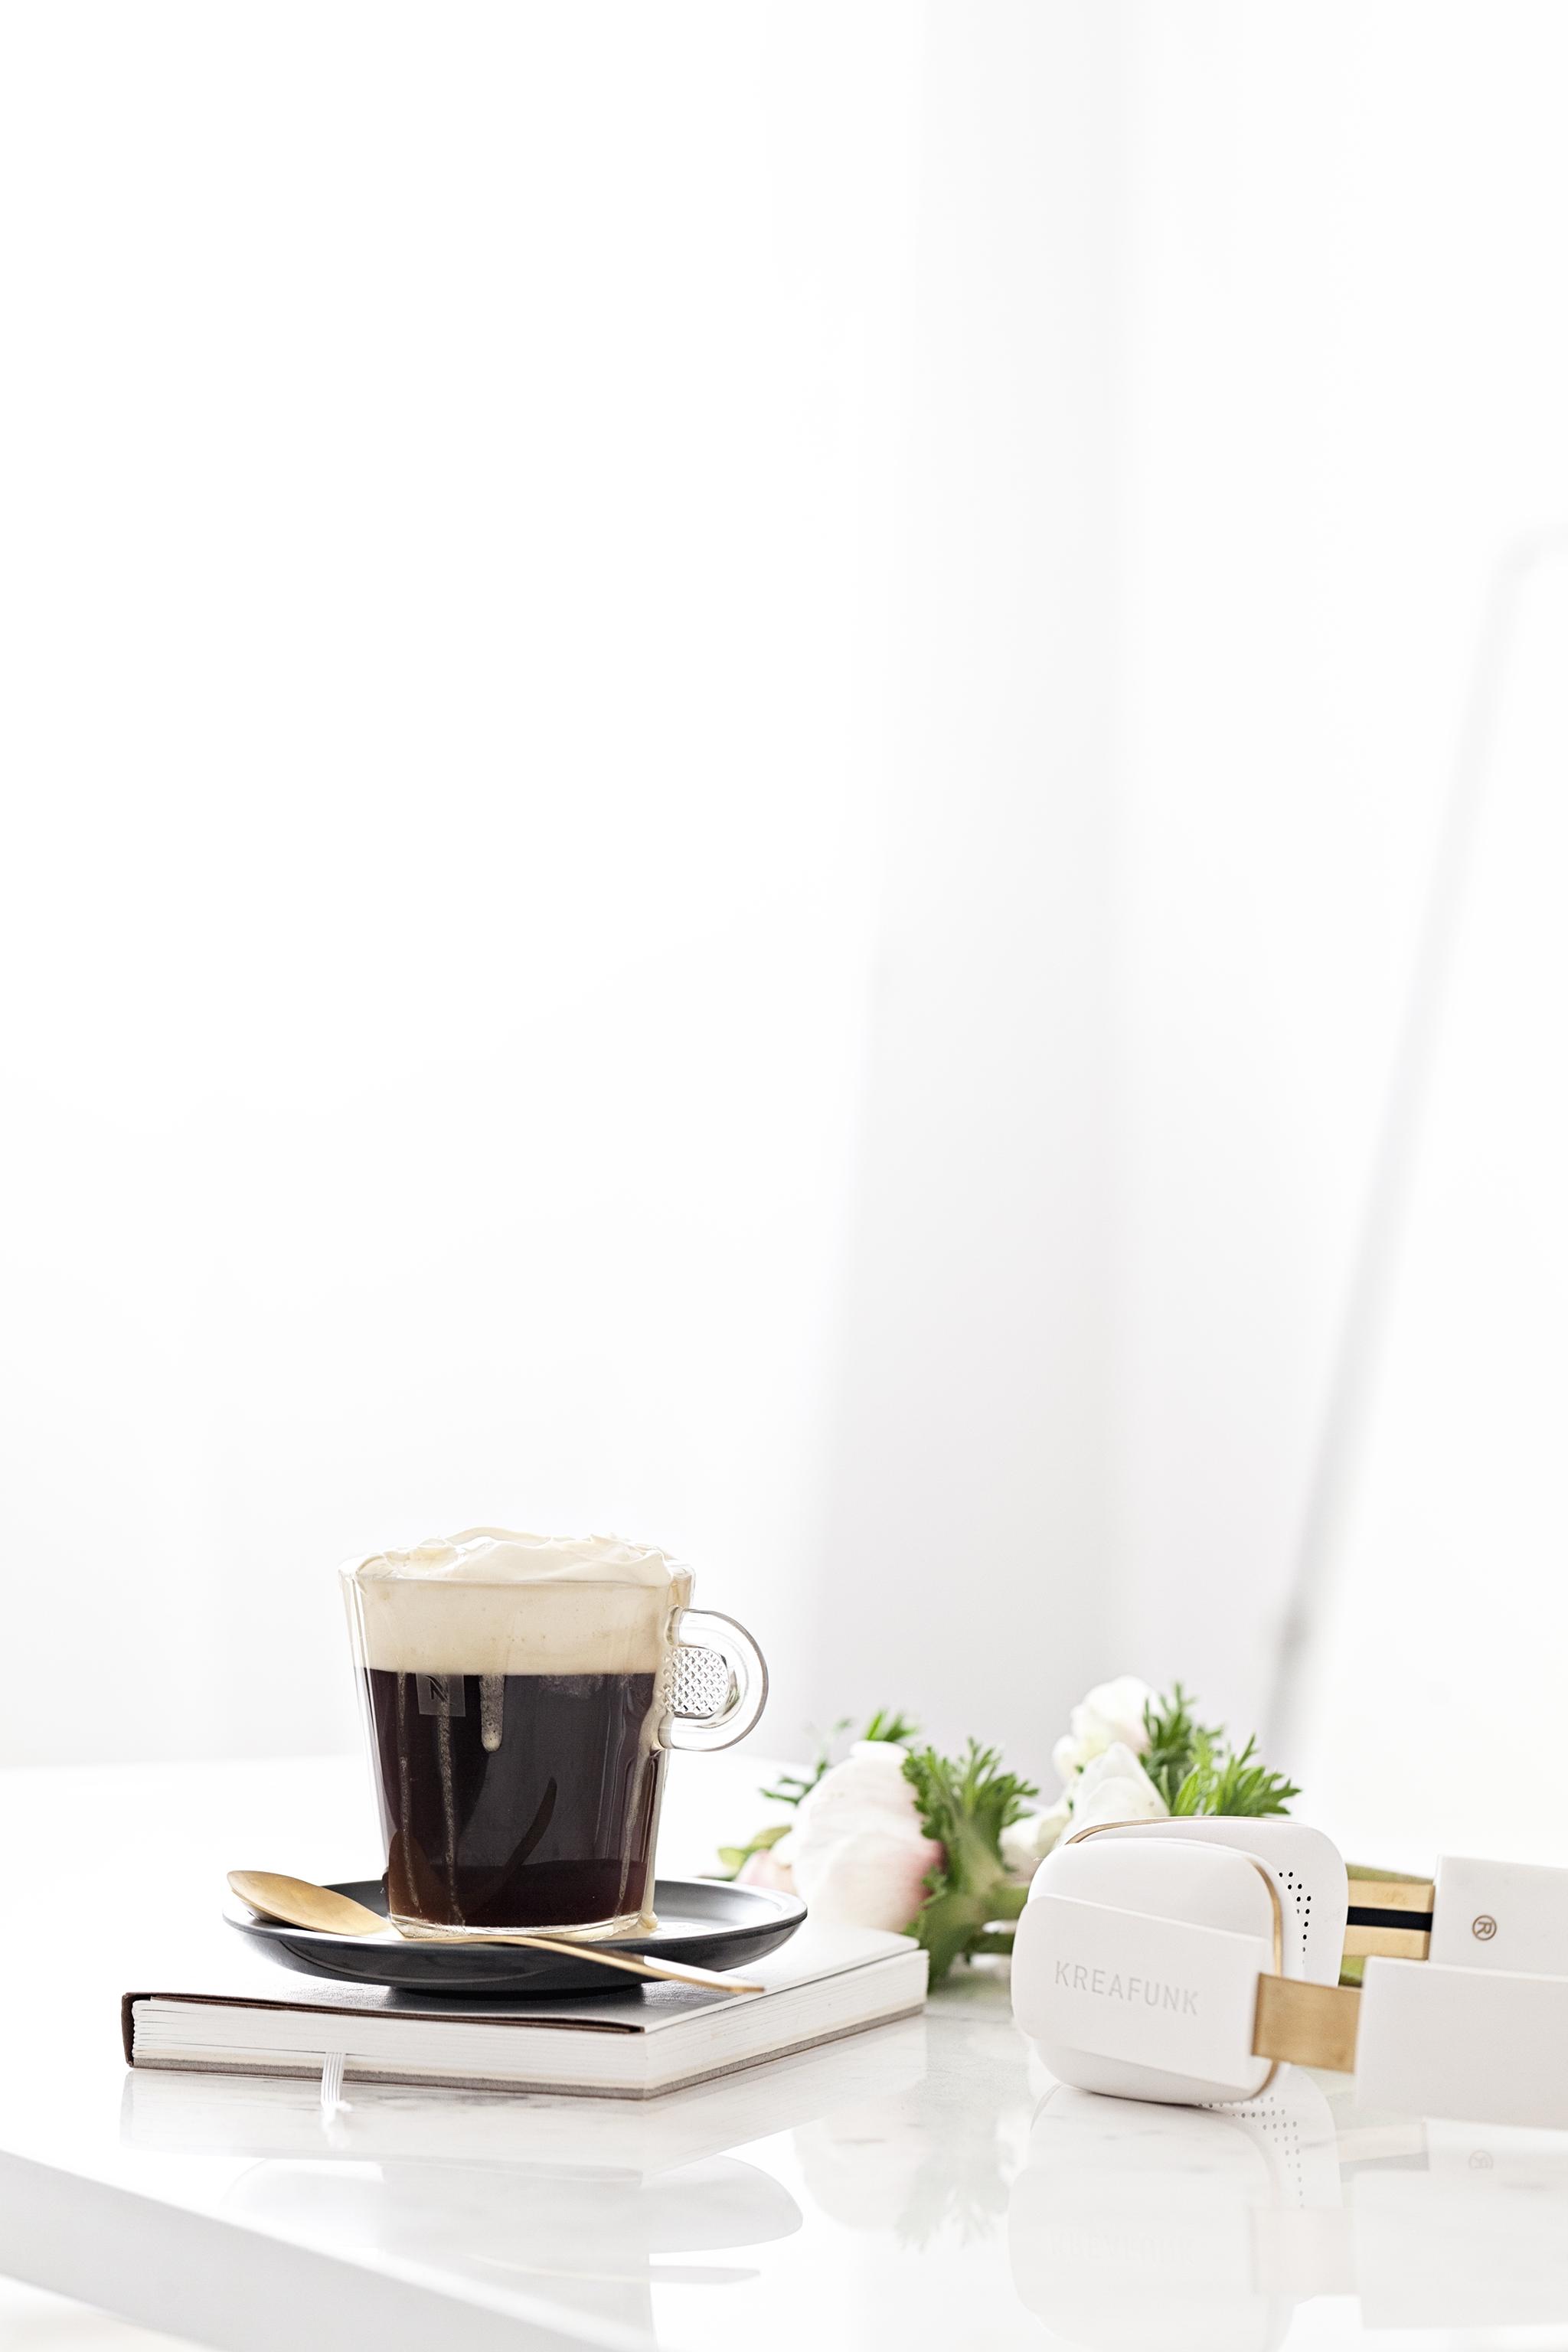 Nespresso Irish Coffee | Kreafunk aHead